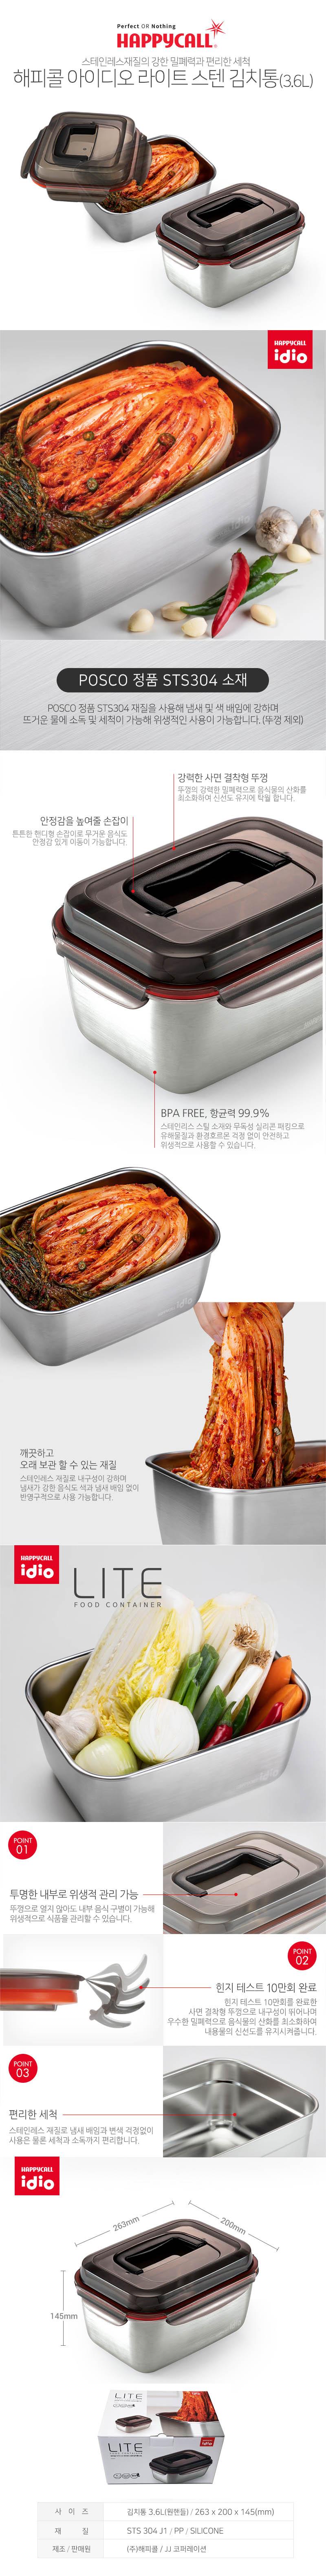 happycall light kimchi3.6l-d.jpg